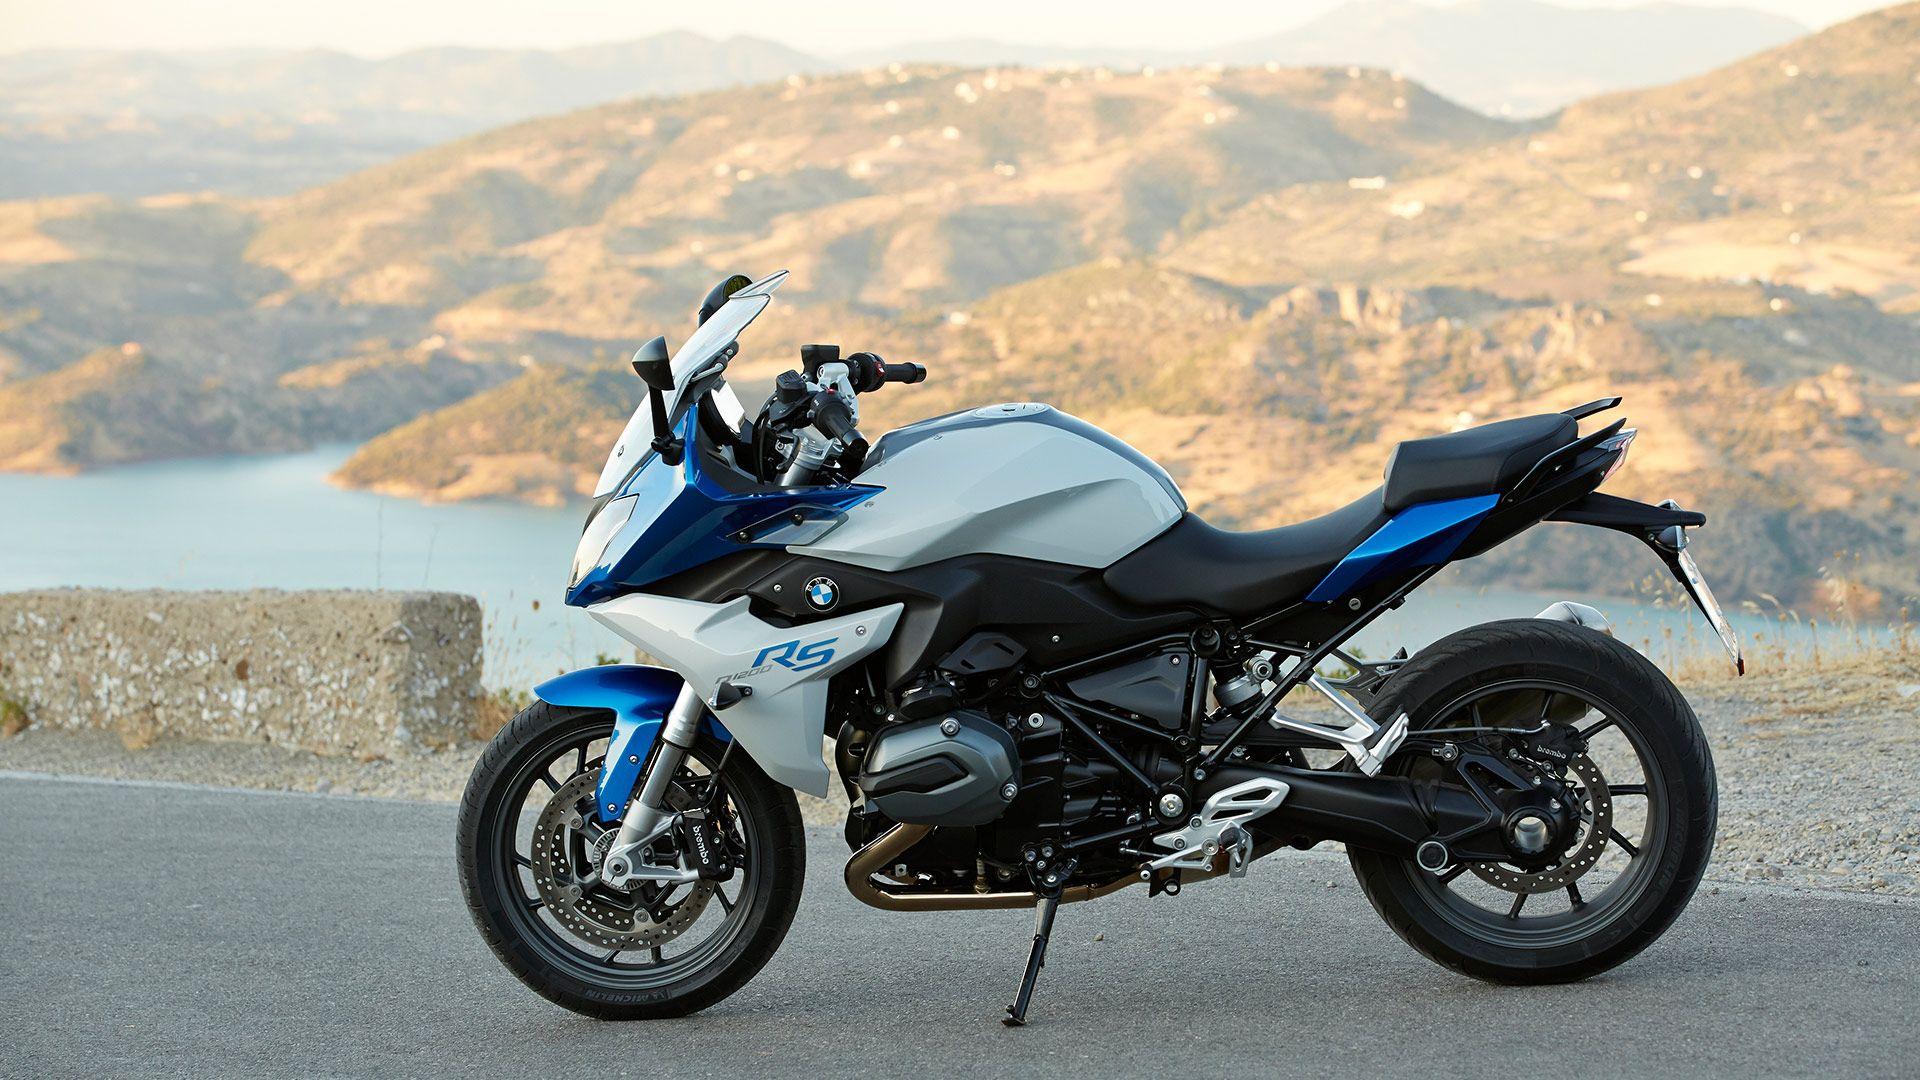 http://www.bmwmotorcycles/us/en/bike/sportbikes/2014/r1200rs